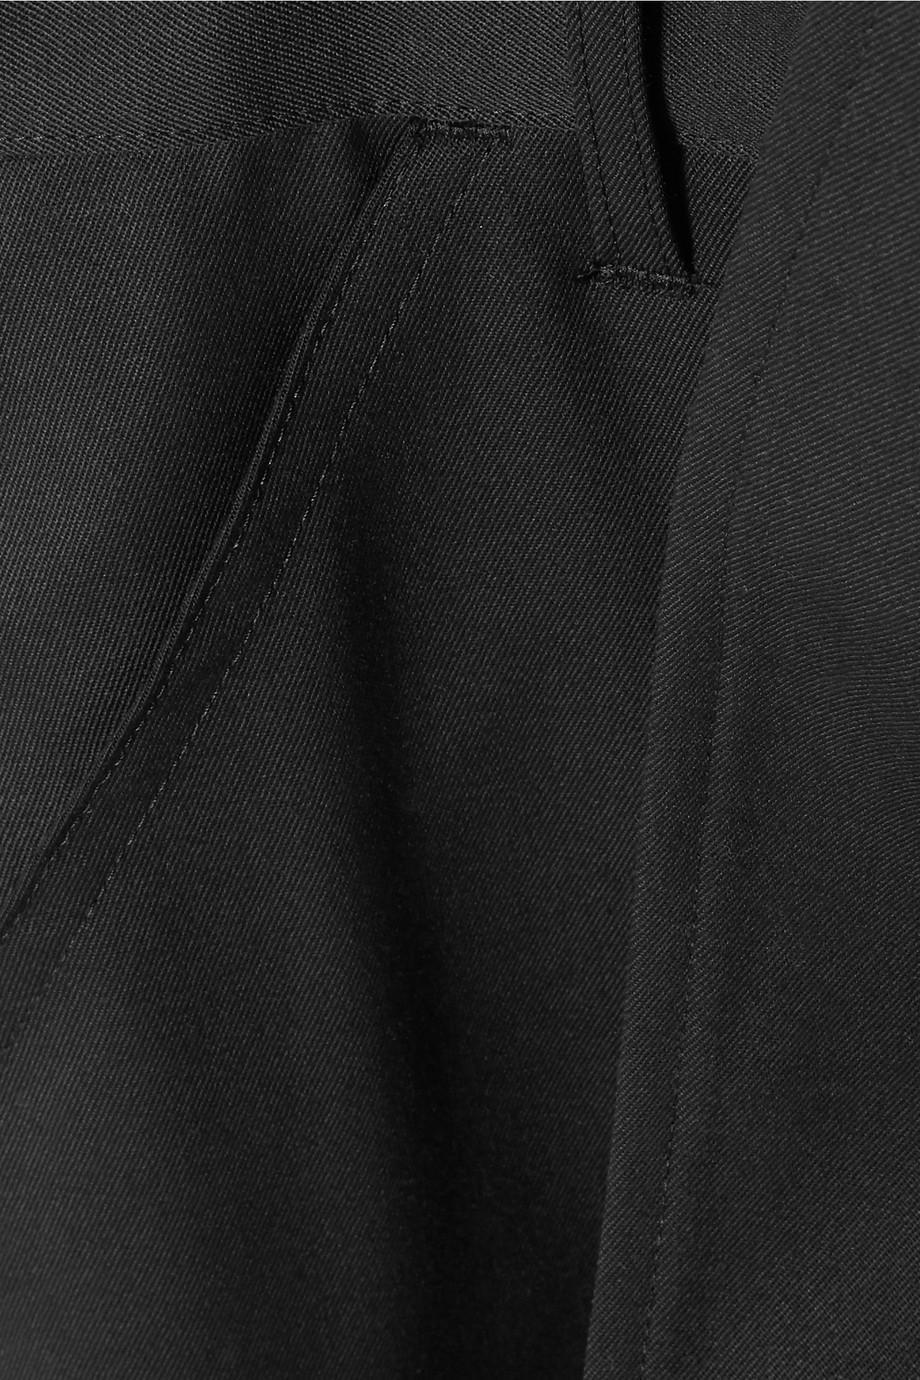 Cropped Wool-twill Overalls - Black Comme Des Garçons 0qOICaZYG